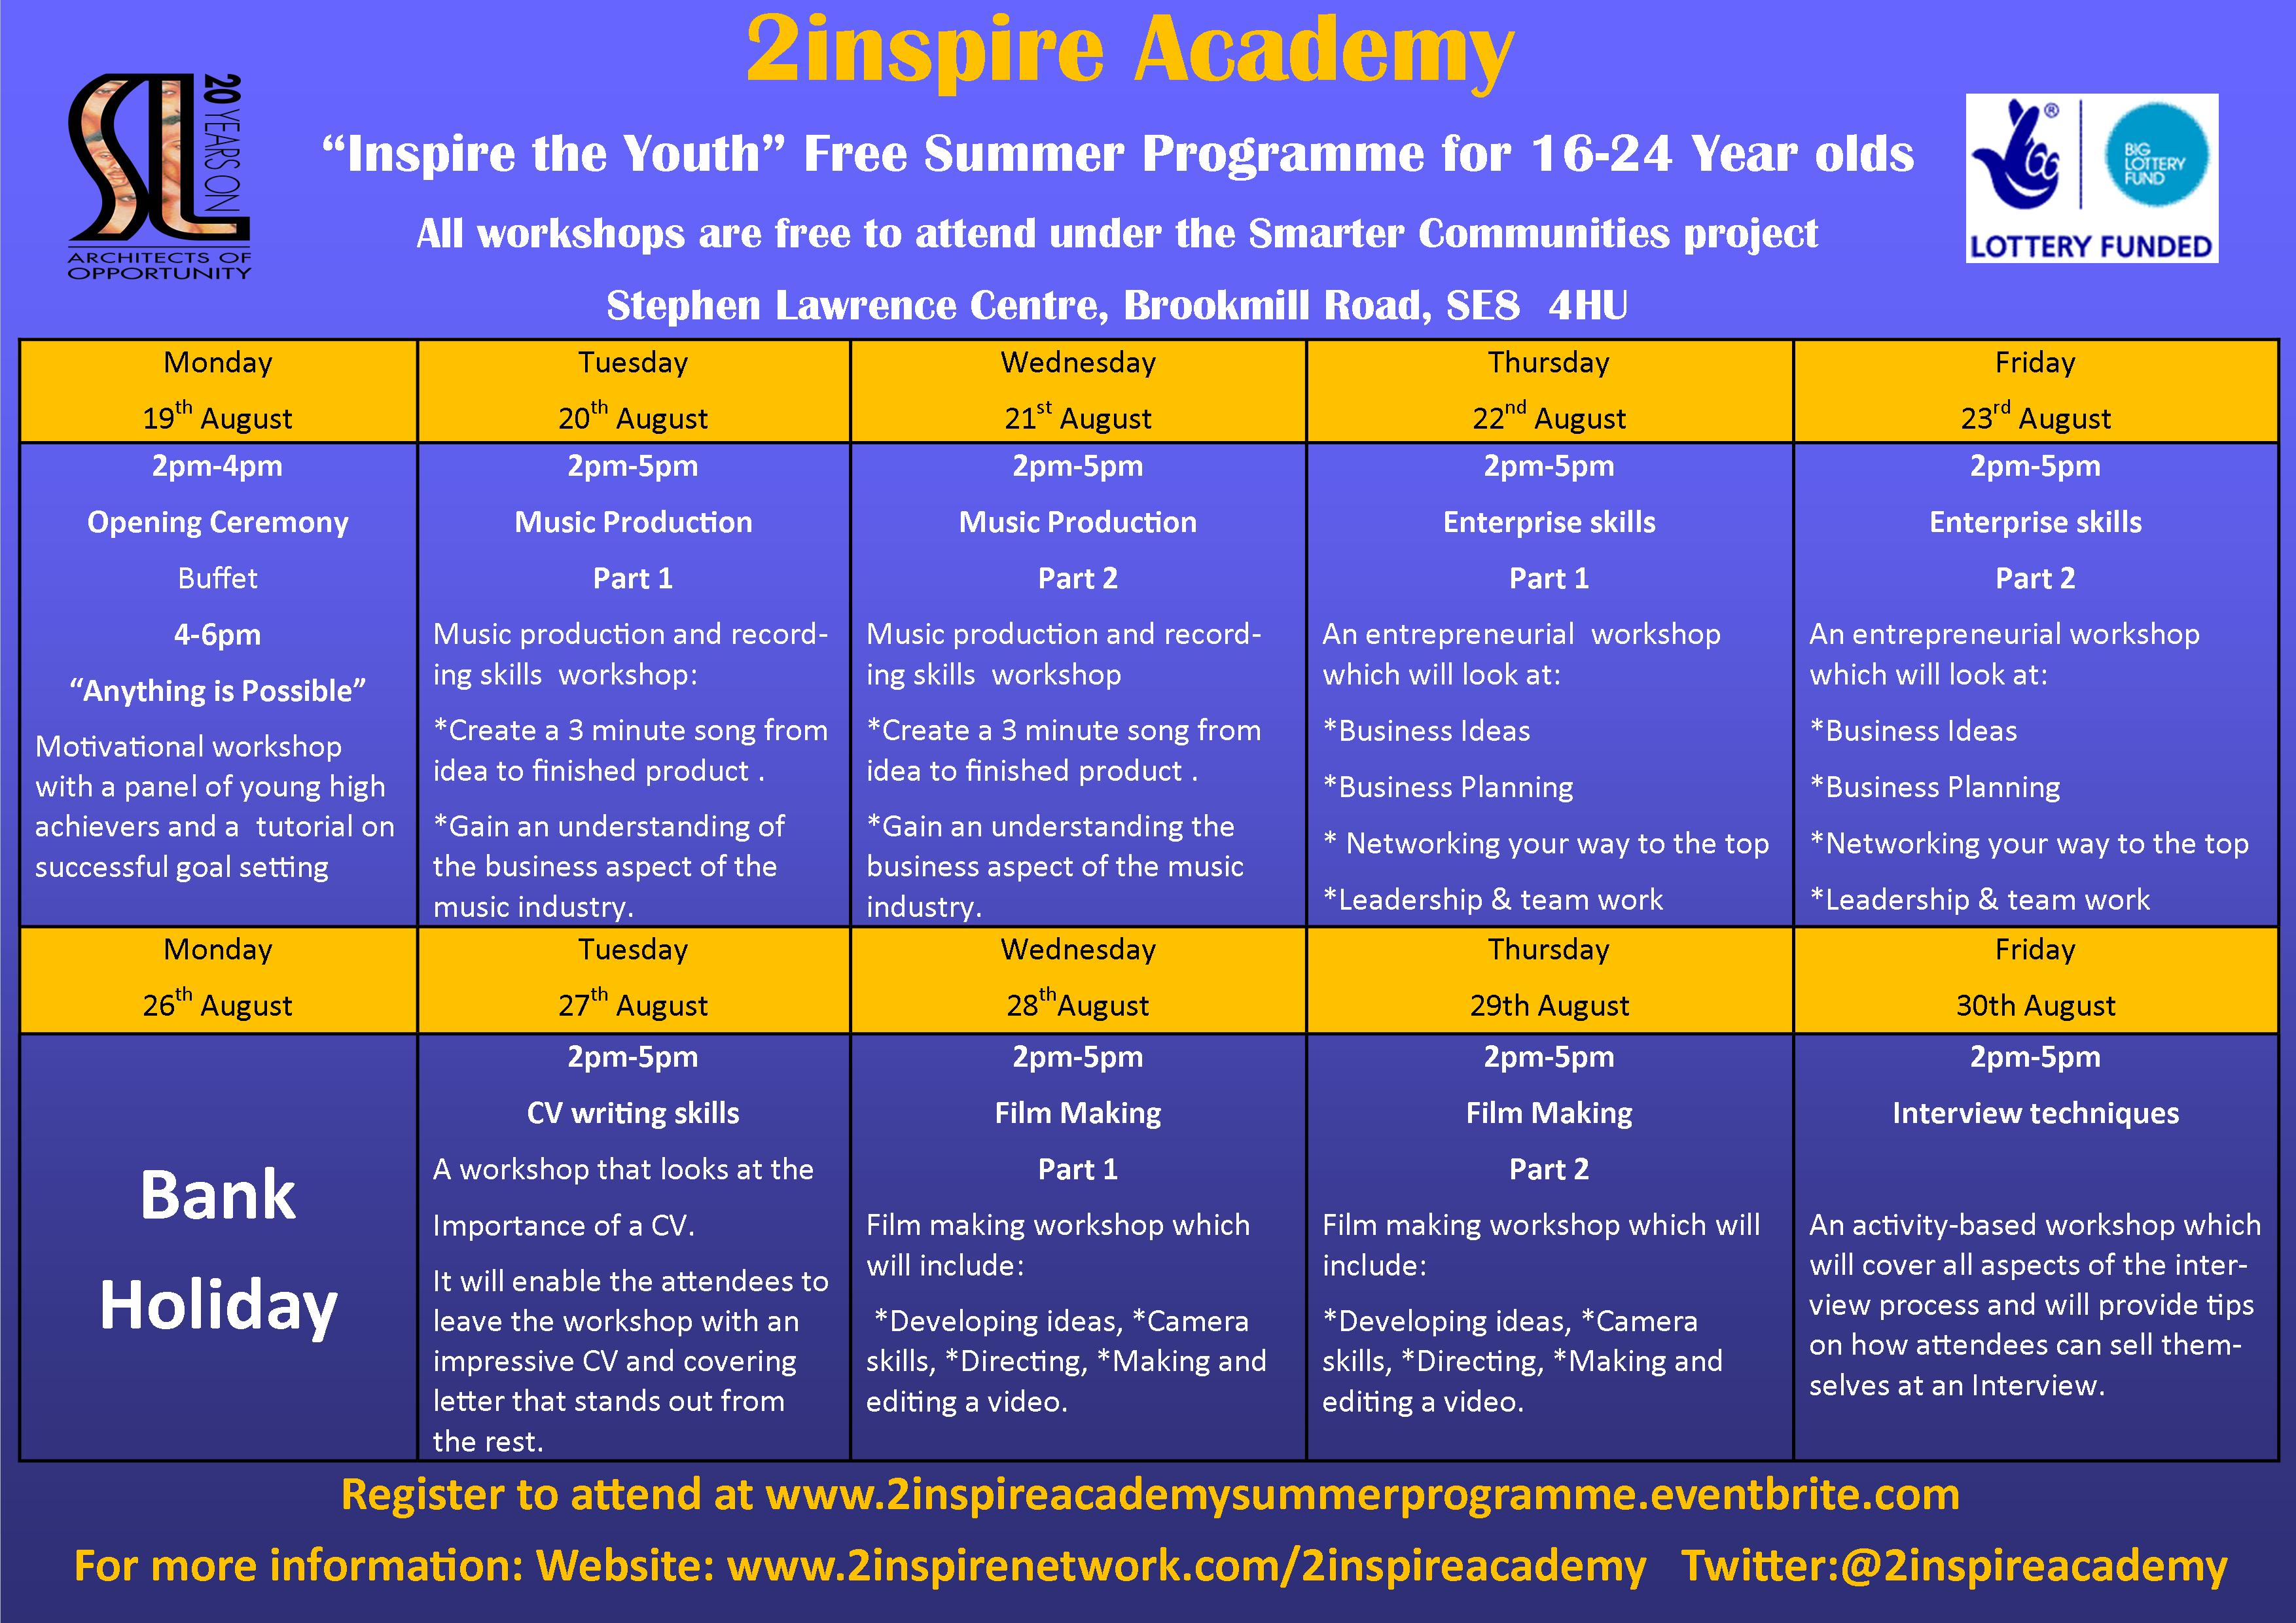 2INSPIRE ACADEMY SUMMER PROGRAMME